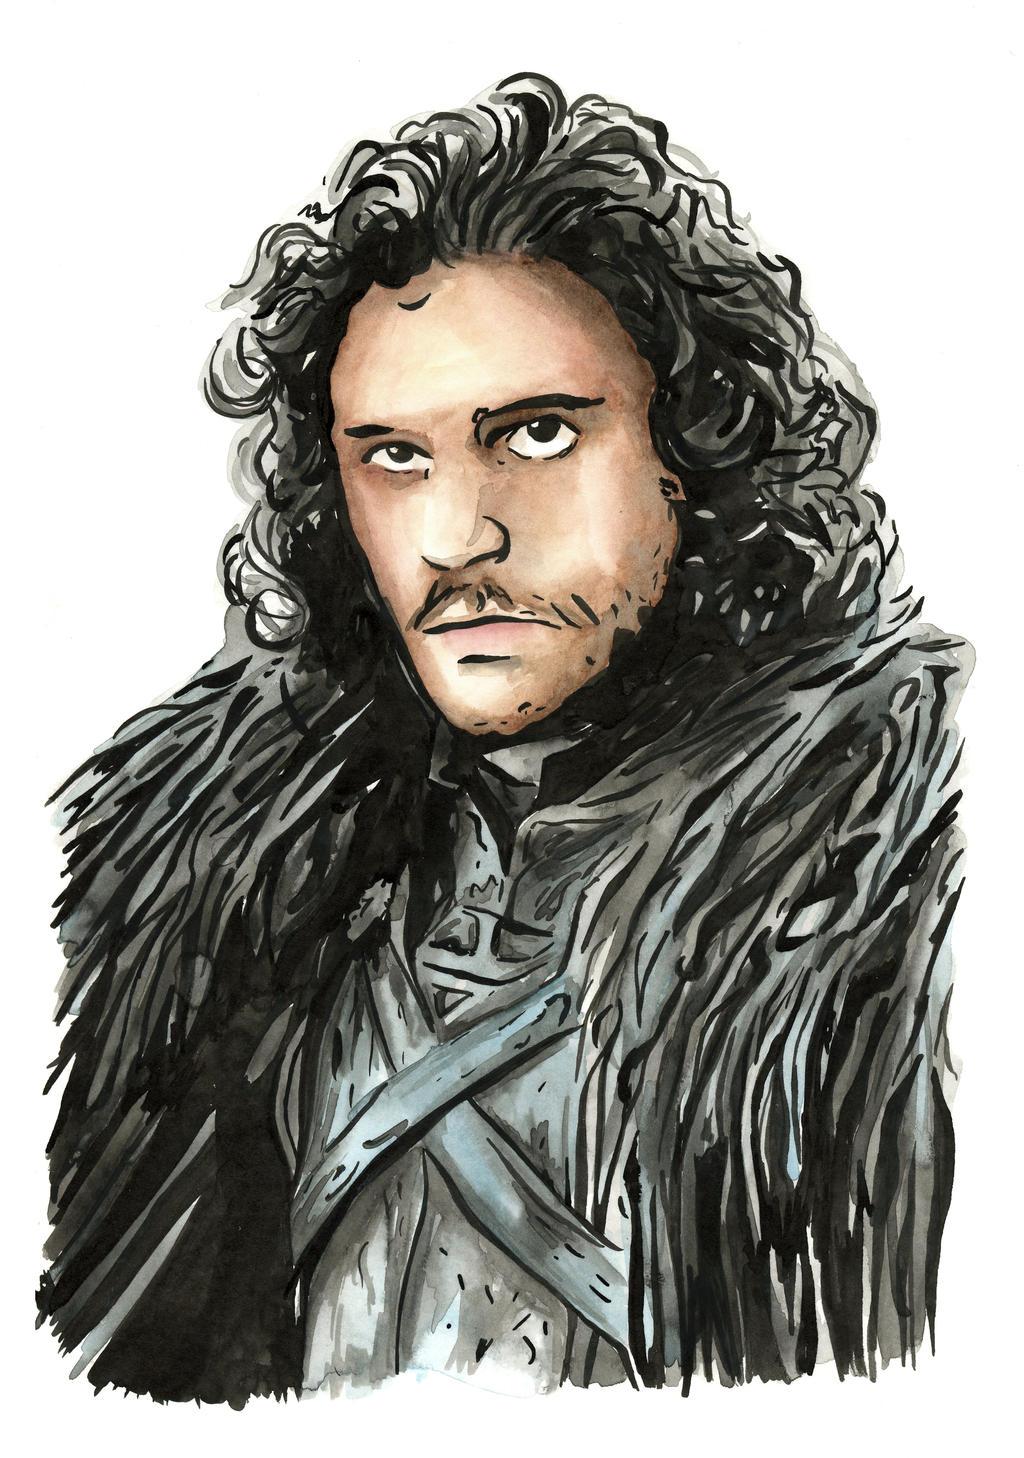 Jon Snow4 by Hummingbird26